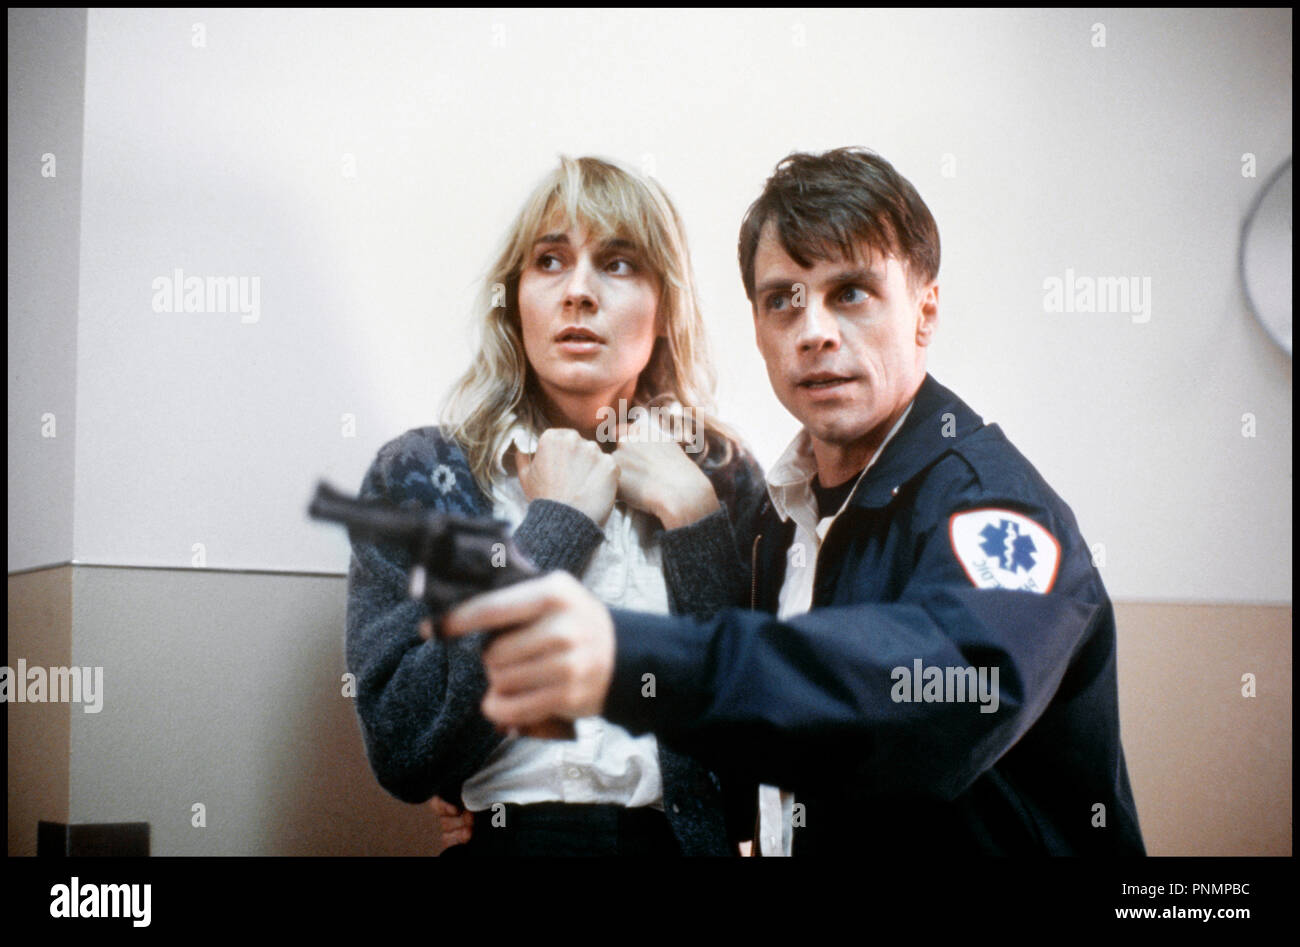 Prod DB © Cannon Group / DR MIDNIGHT RIDE (MIDNIGHT RIDE) de Bob Bralver 1990 USA avec Savina Gersak et Mark Hamill infirmier, braquer, revolver, couple - Stock Image